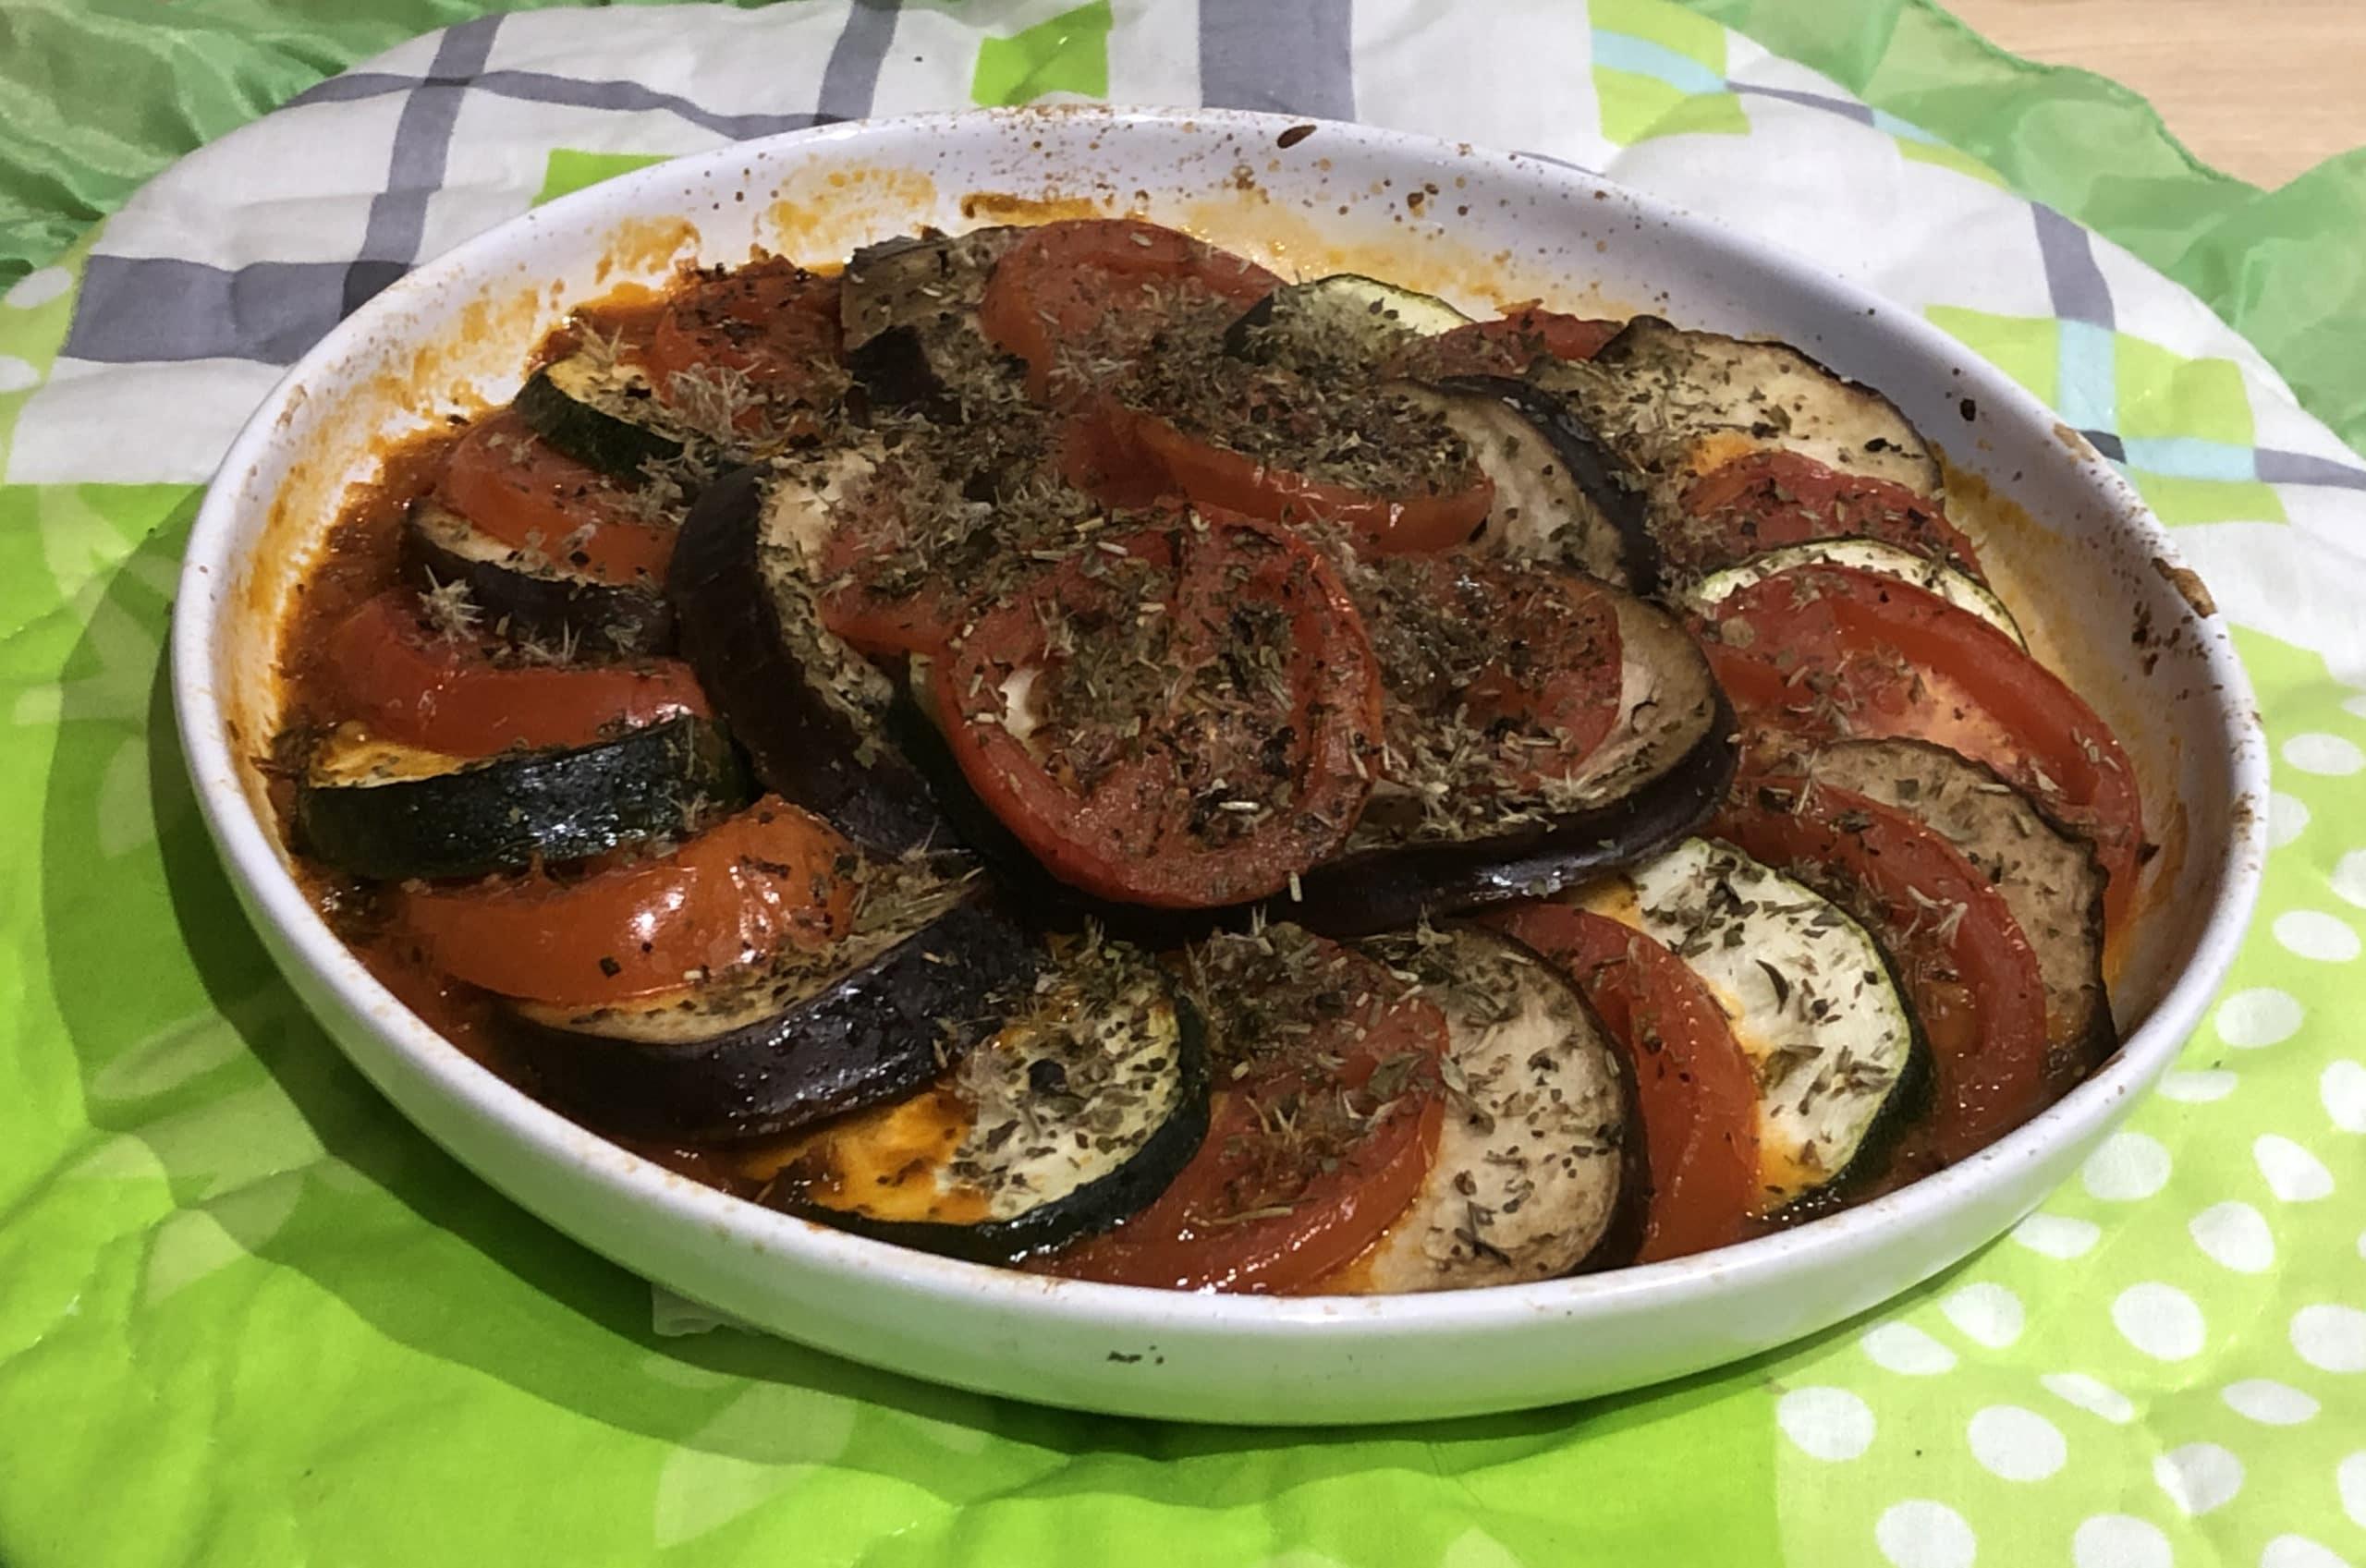 Ratatouille, una delicia vegetariana de la comida francesa